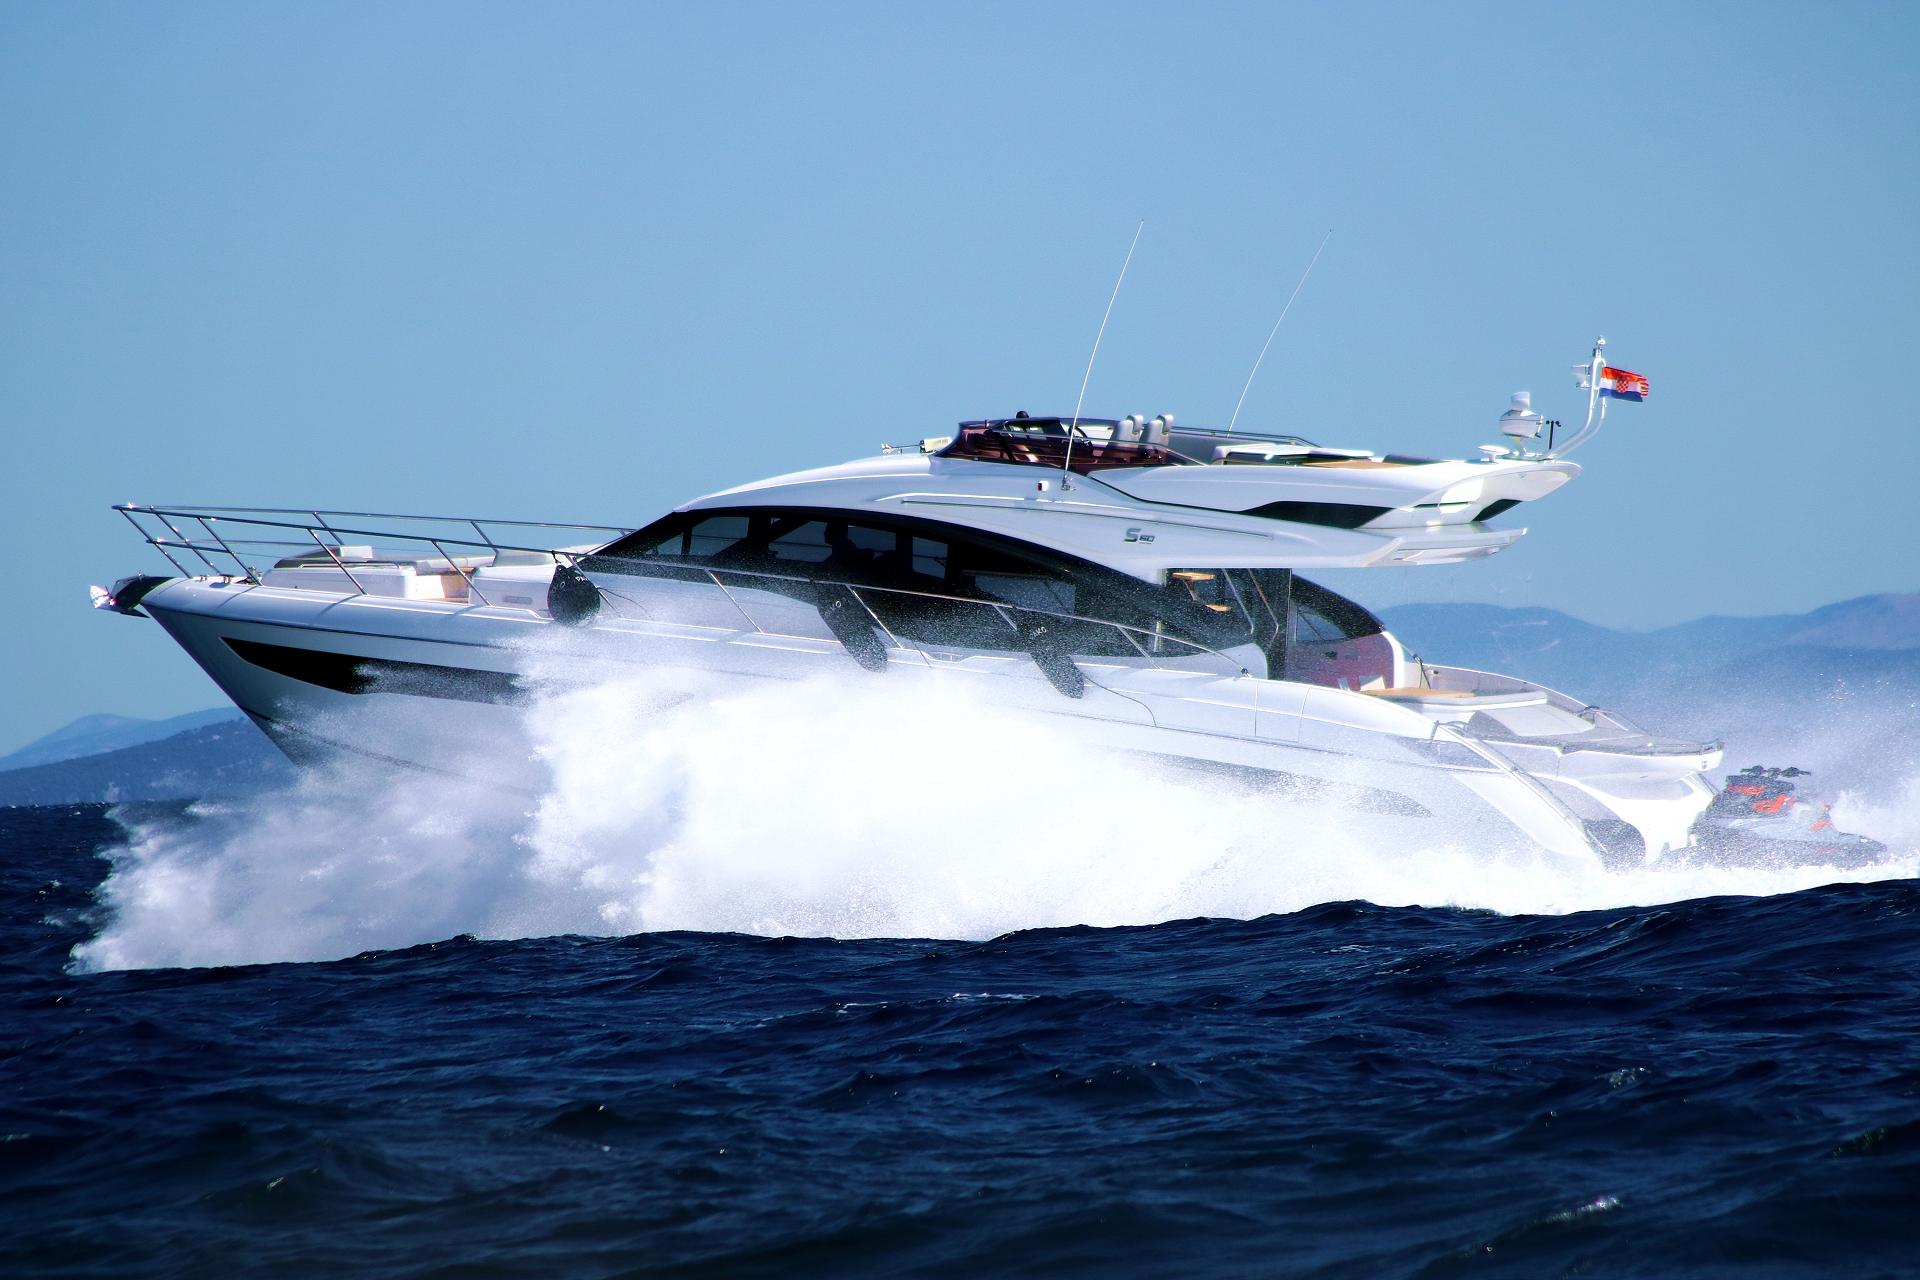 online Bootsanmeldung kroatien permit vignette aufenthaltsgebühr kurtaxe boot kroatienkroatien